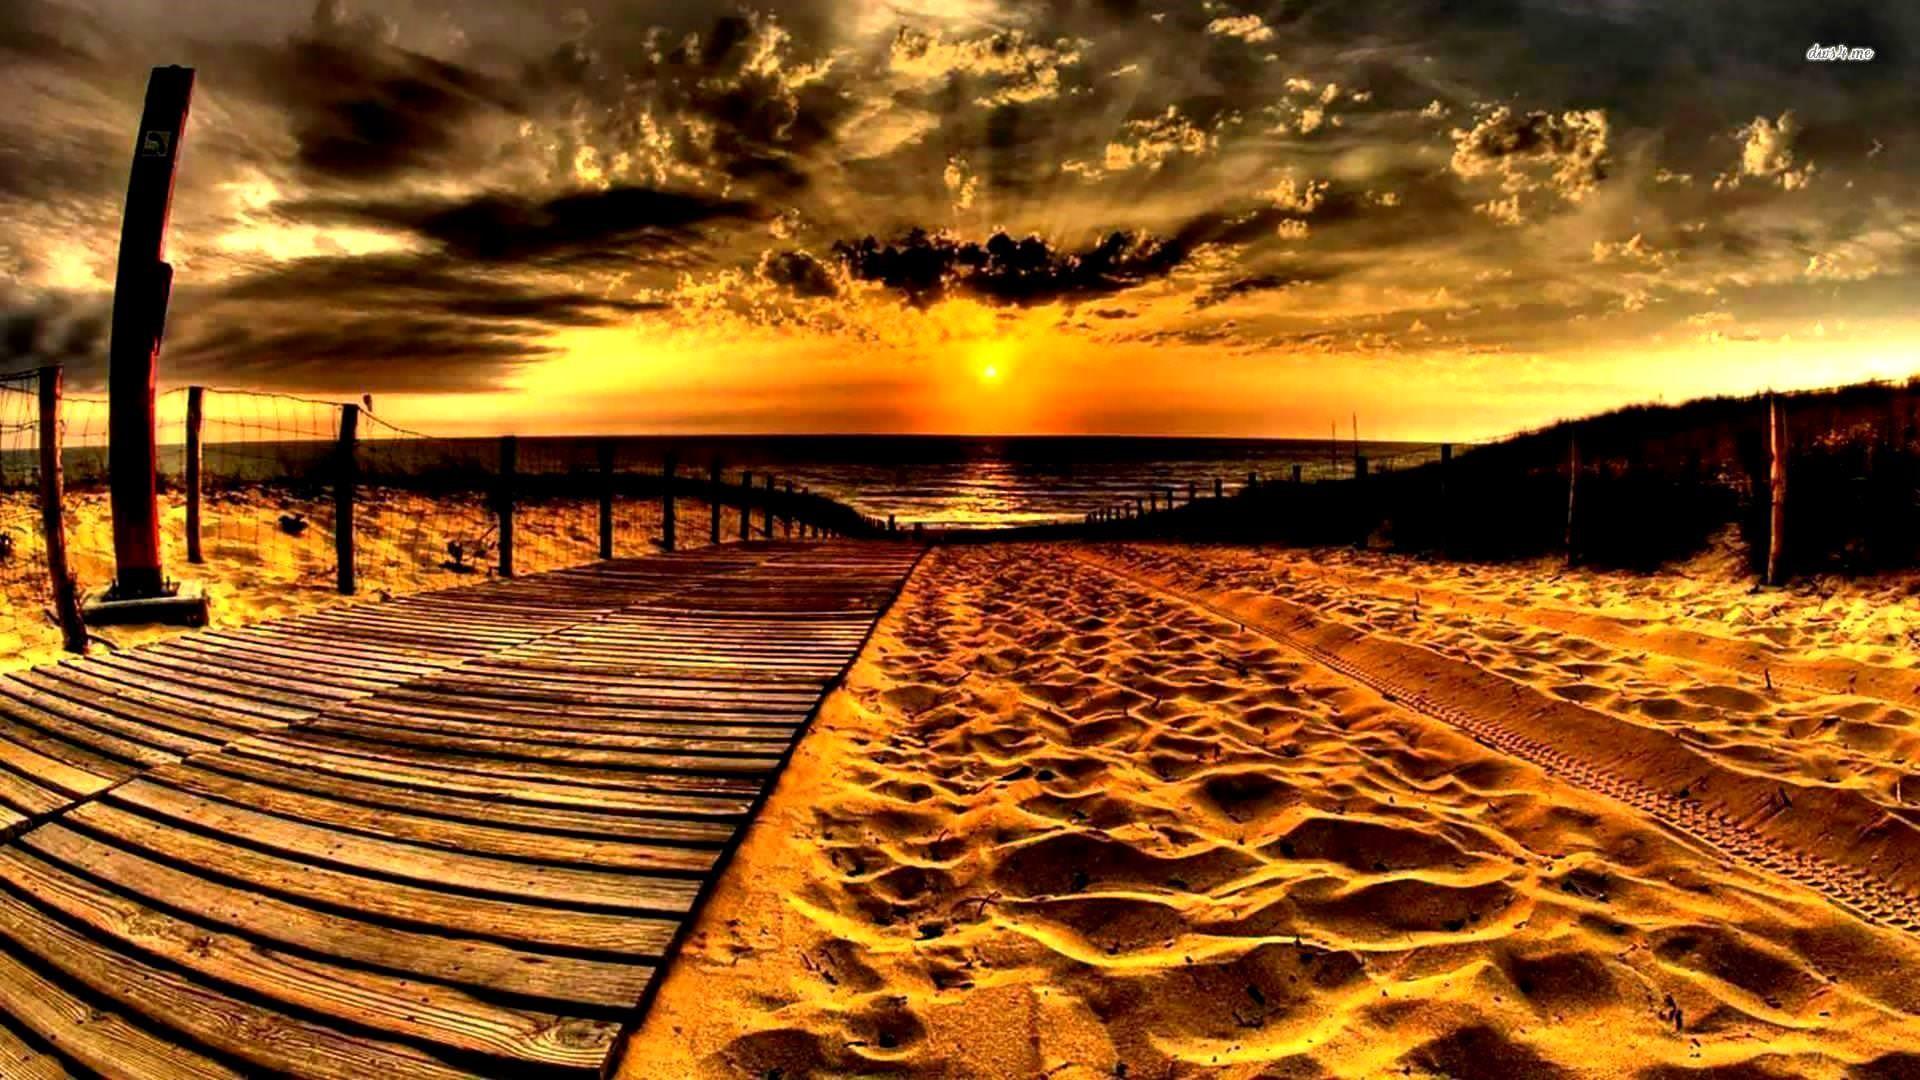 Beach Sunset HD Background